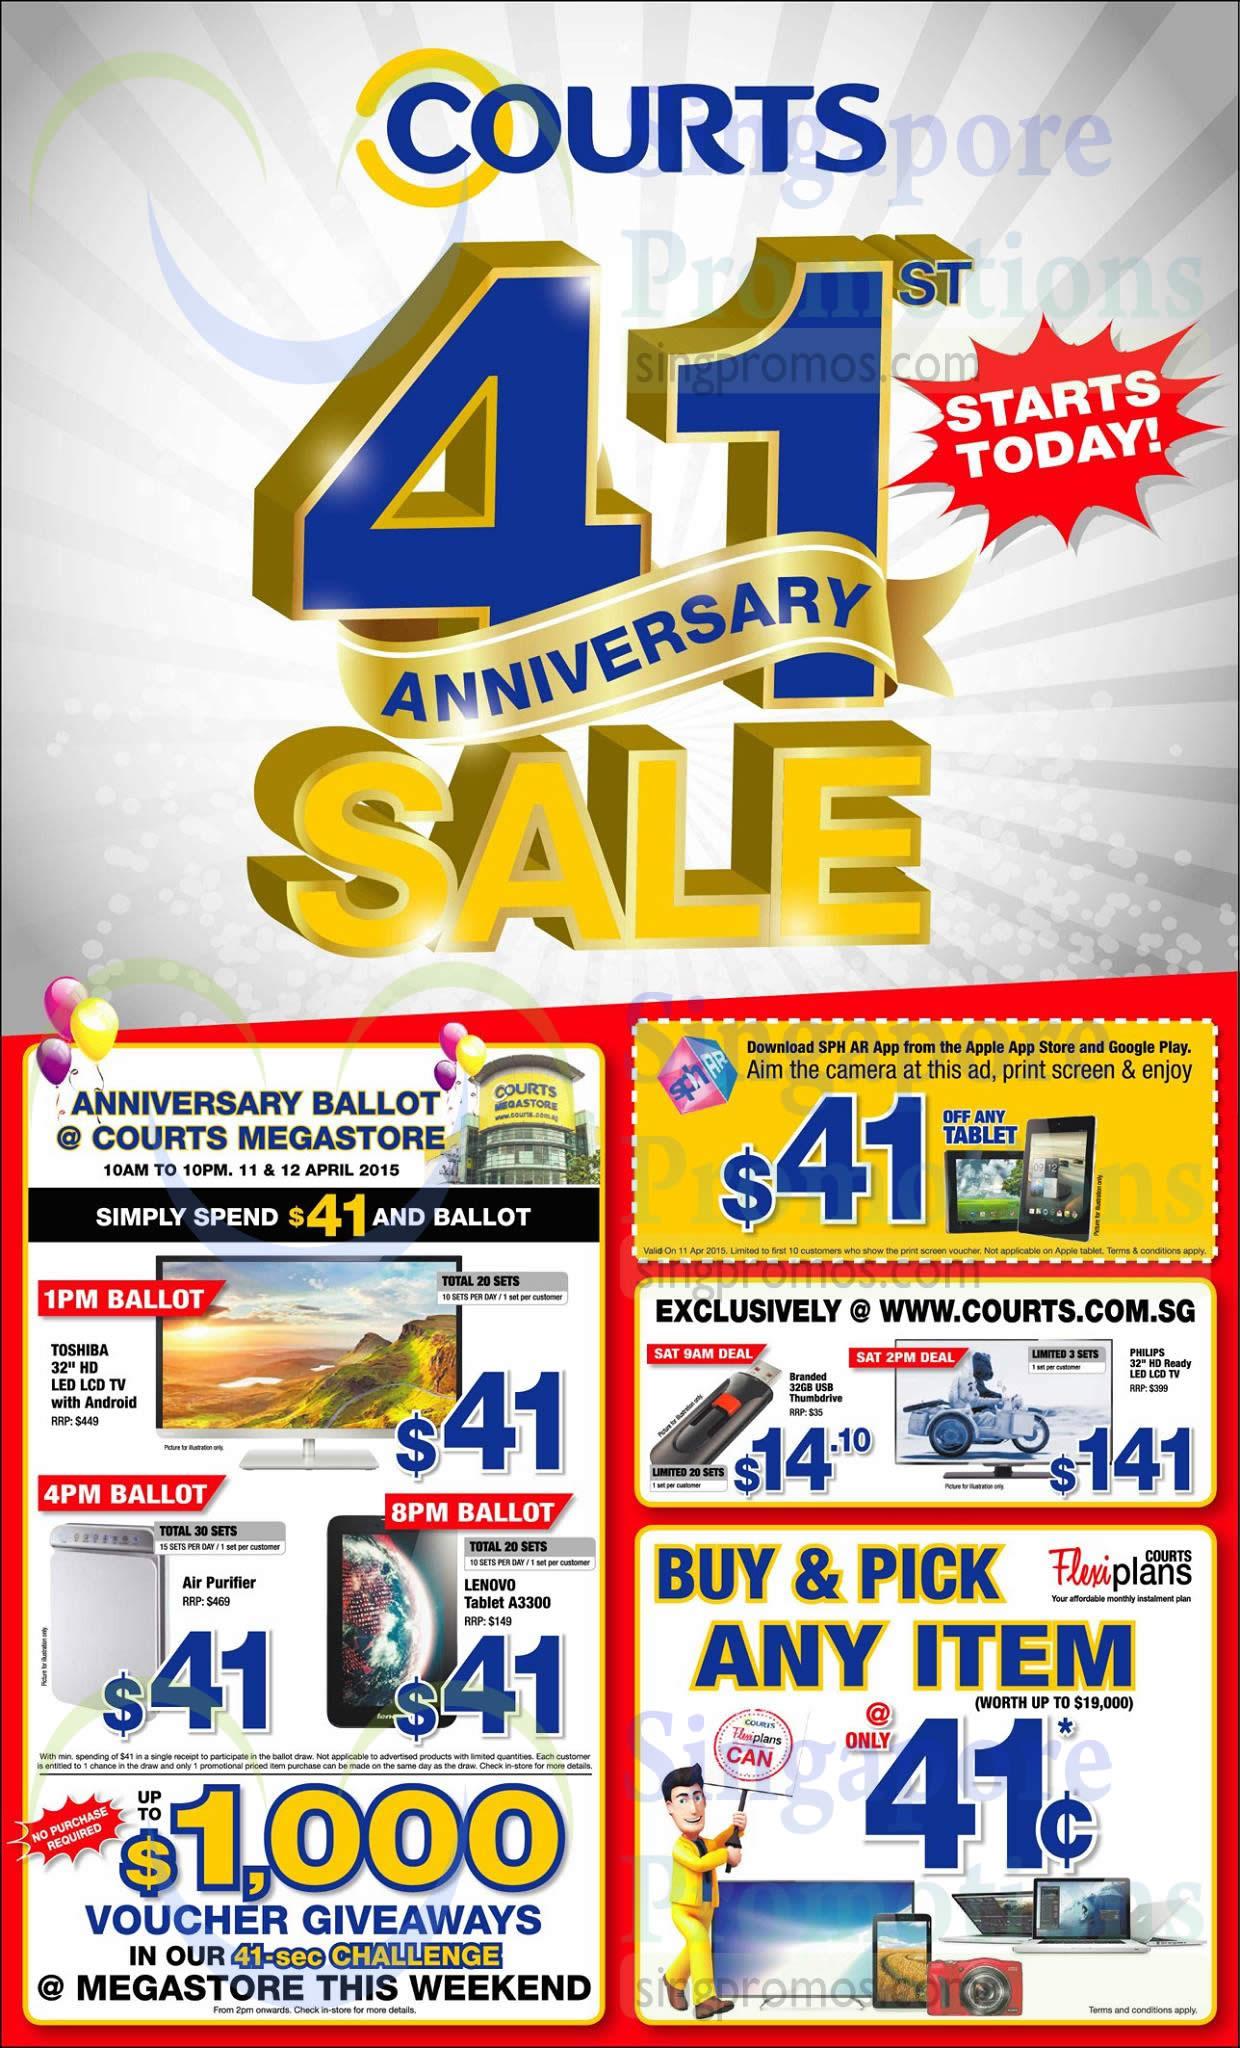 41st Anniversary Sale Specials, Megastore Anniversary Ballot, Voucher Giveaways, Lenovo Tablet A3300, Air Purifier, Toshiba TV